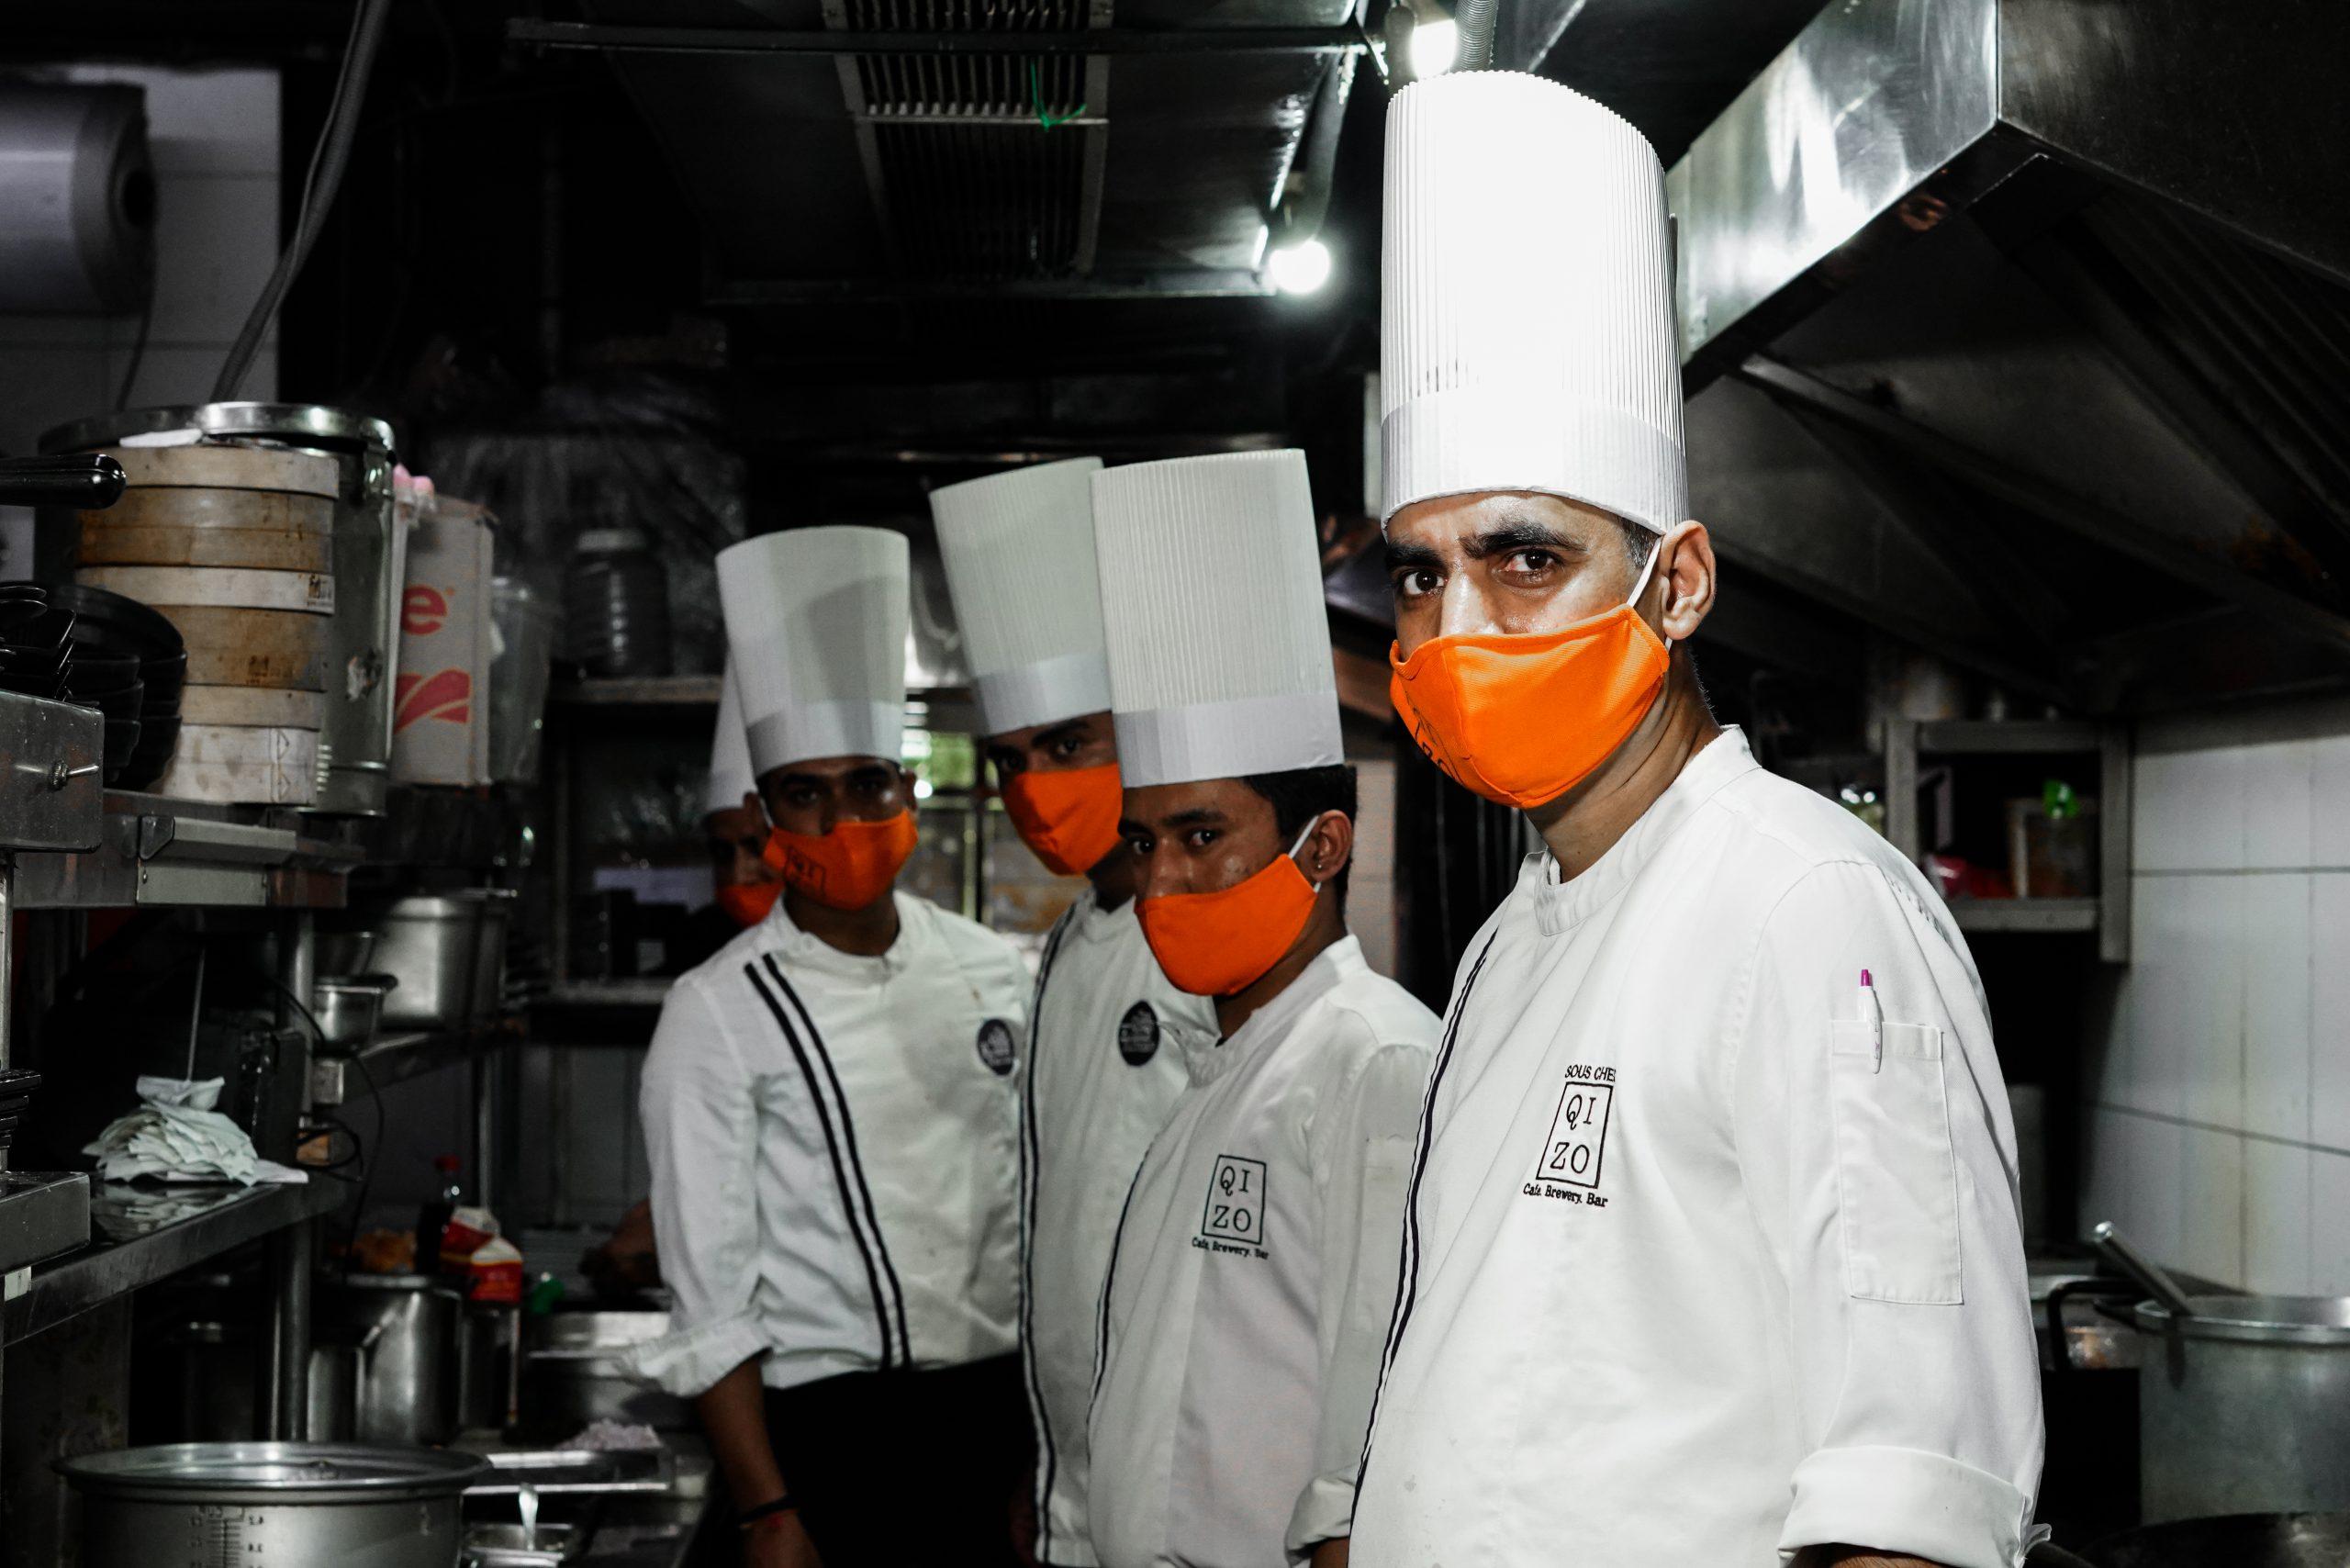 Chefs in the Kitchen wearing Masks